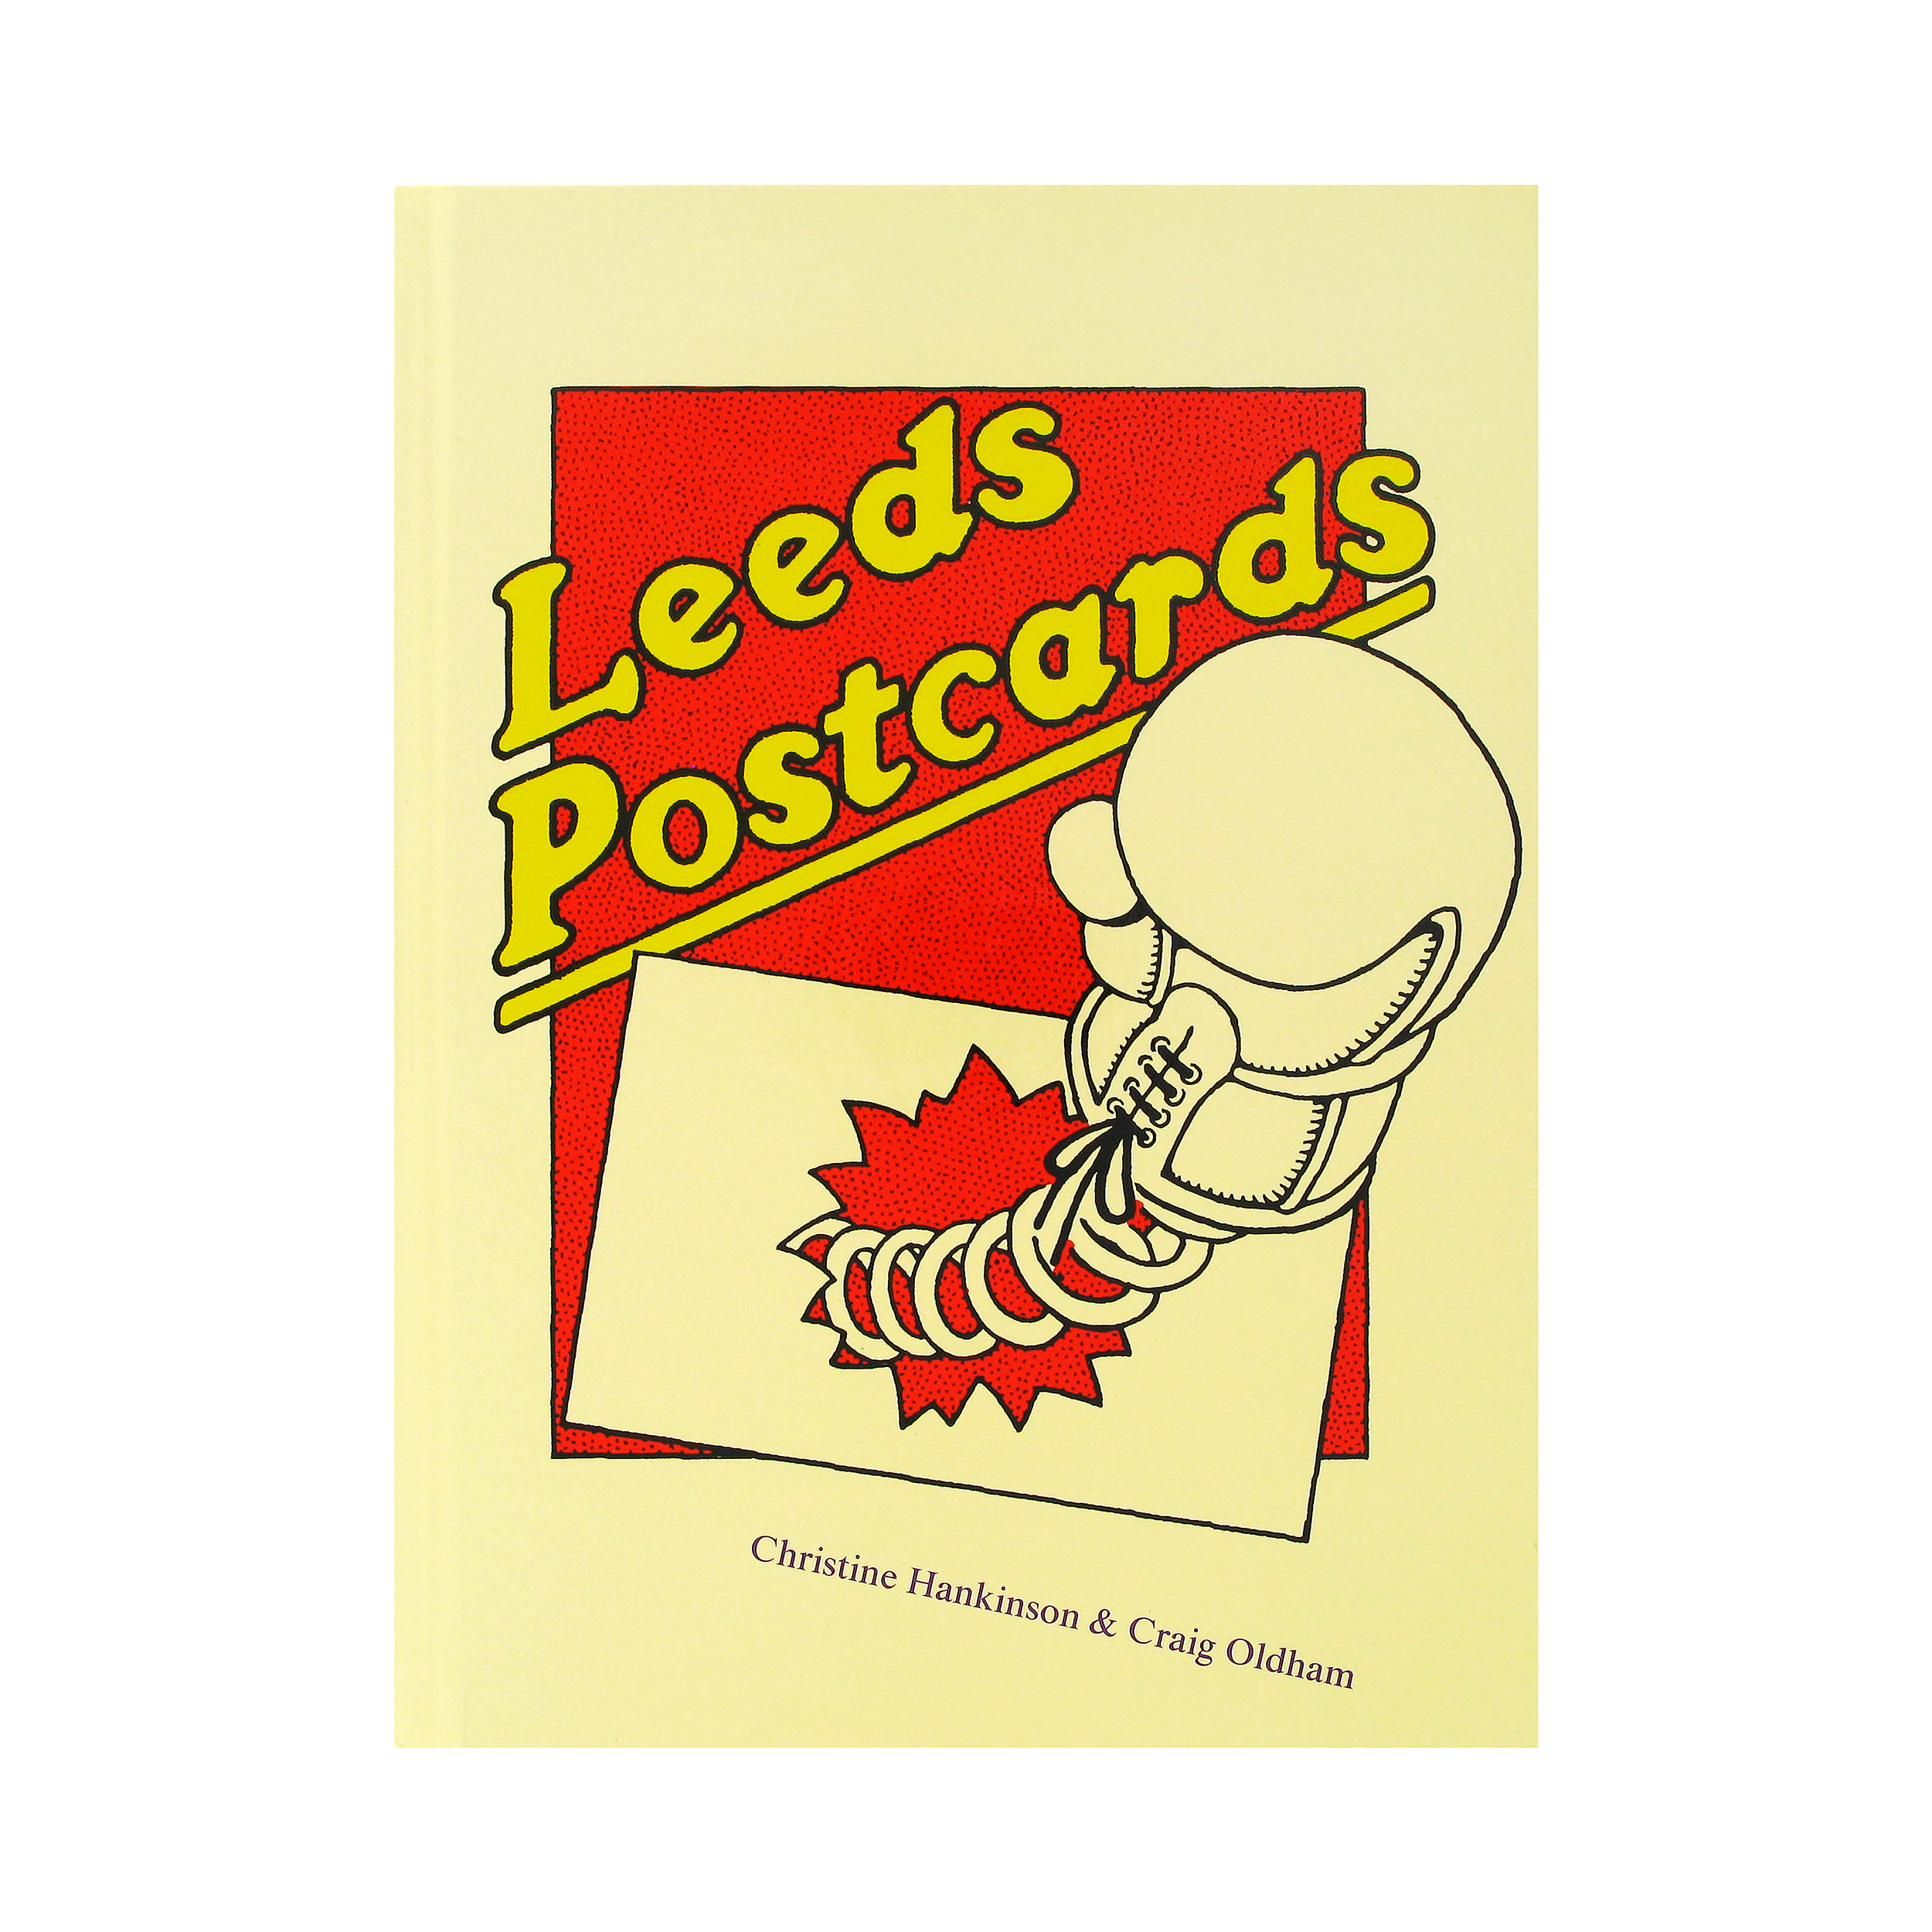 Leeds postcards book